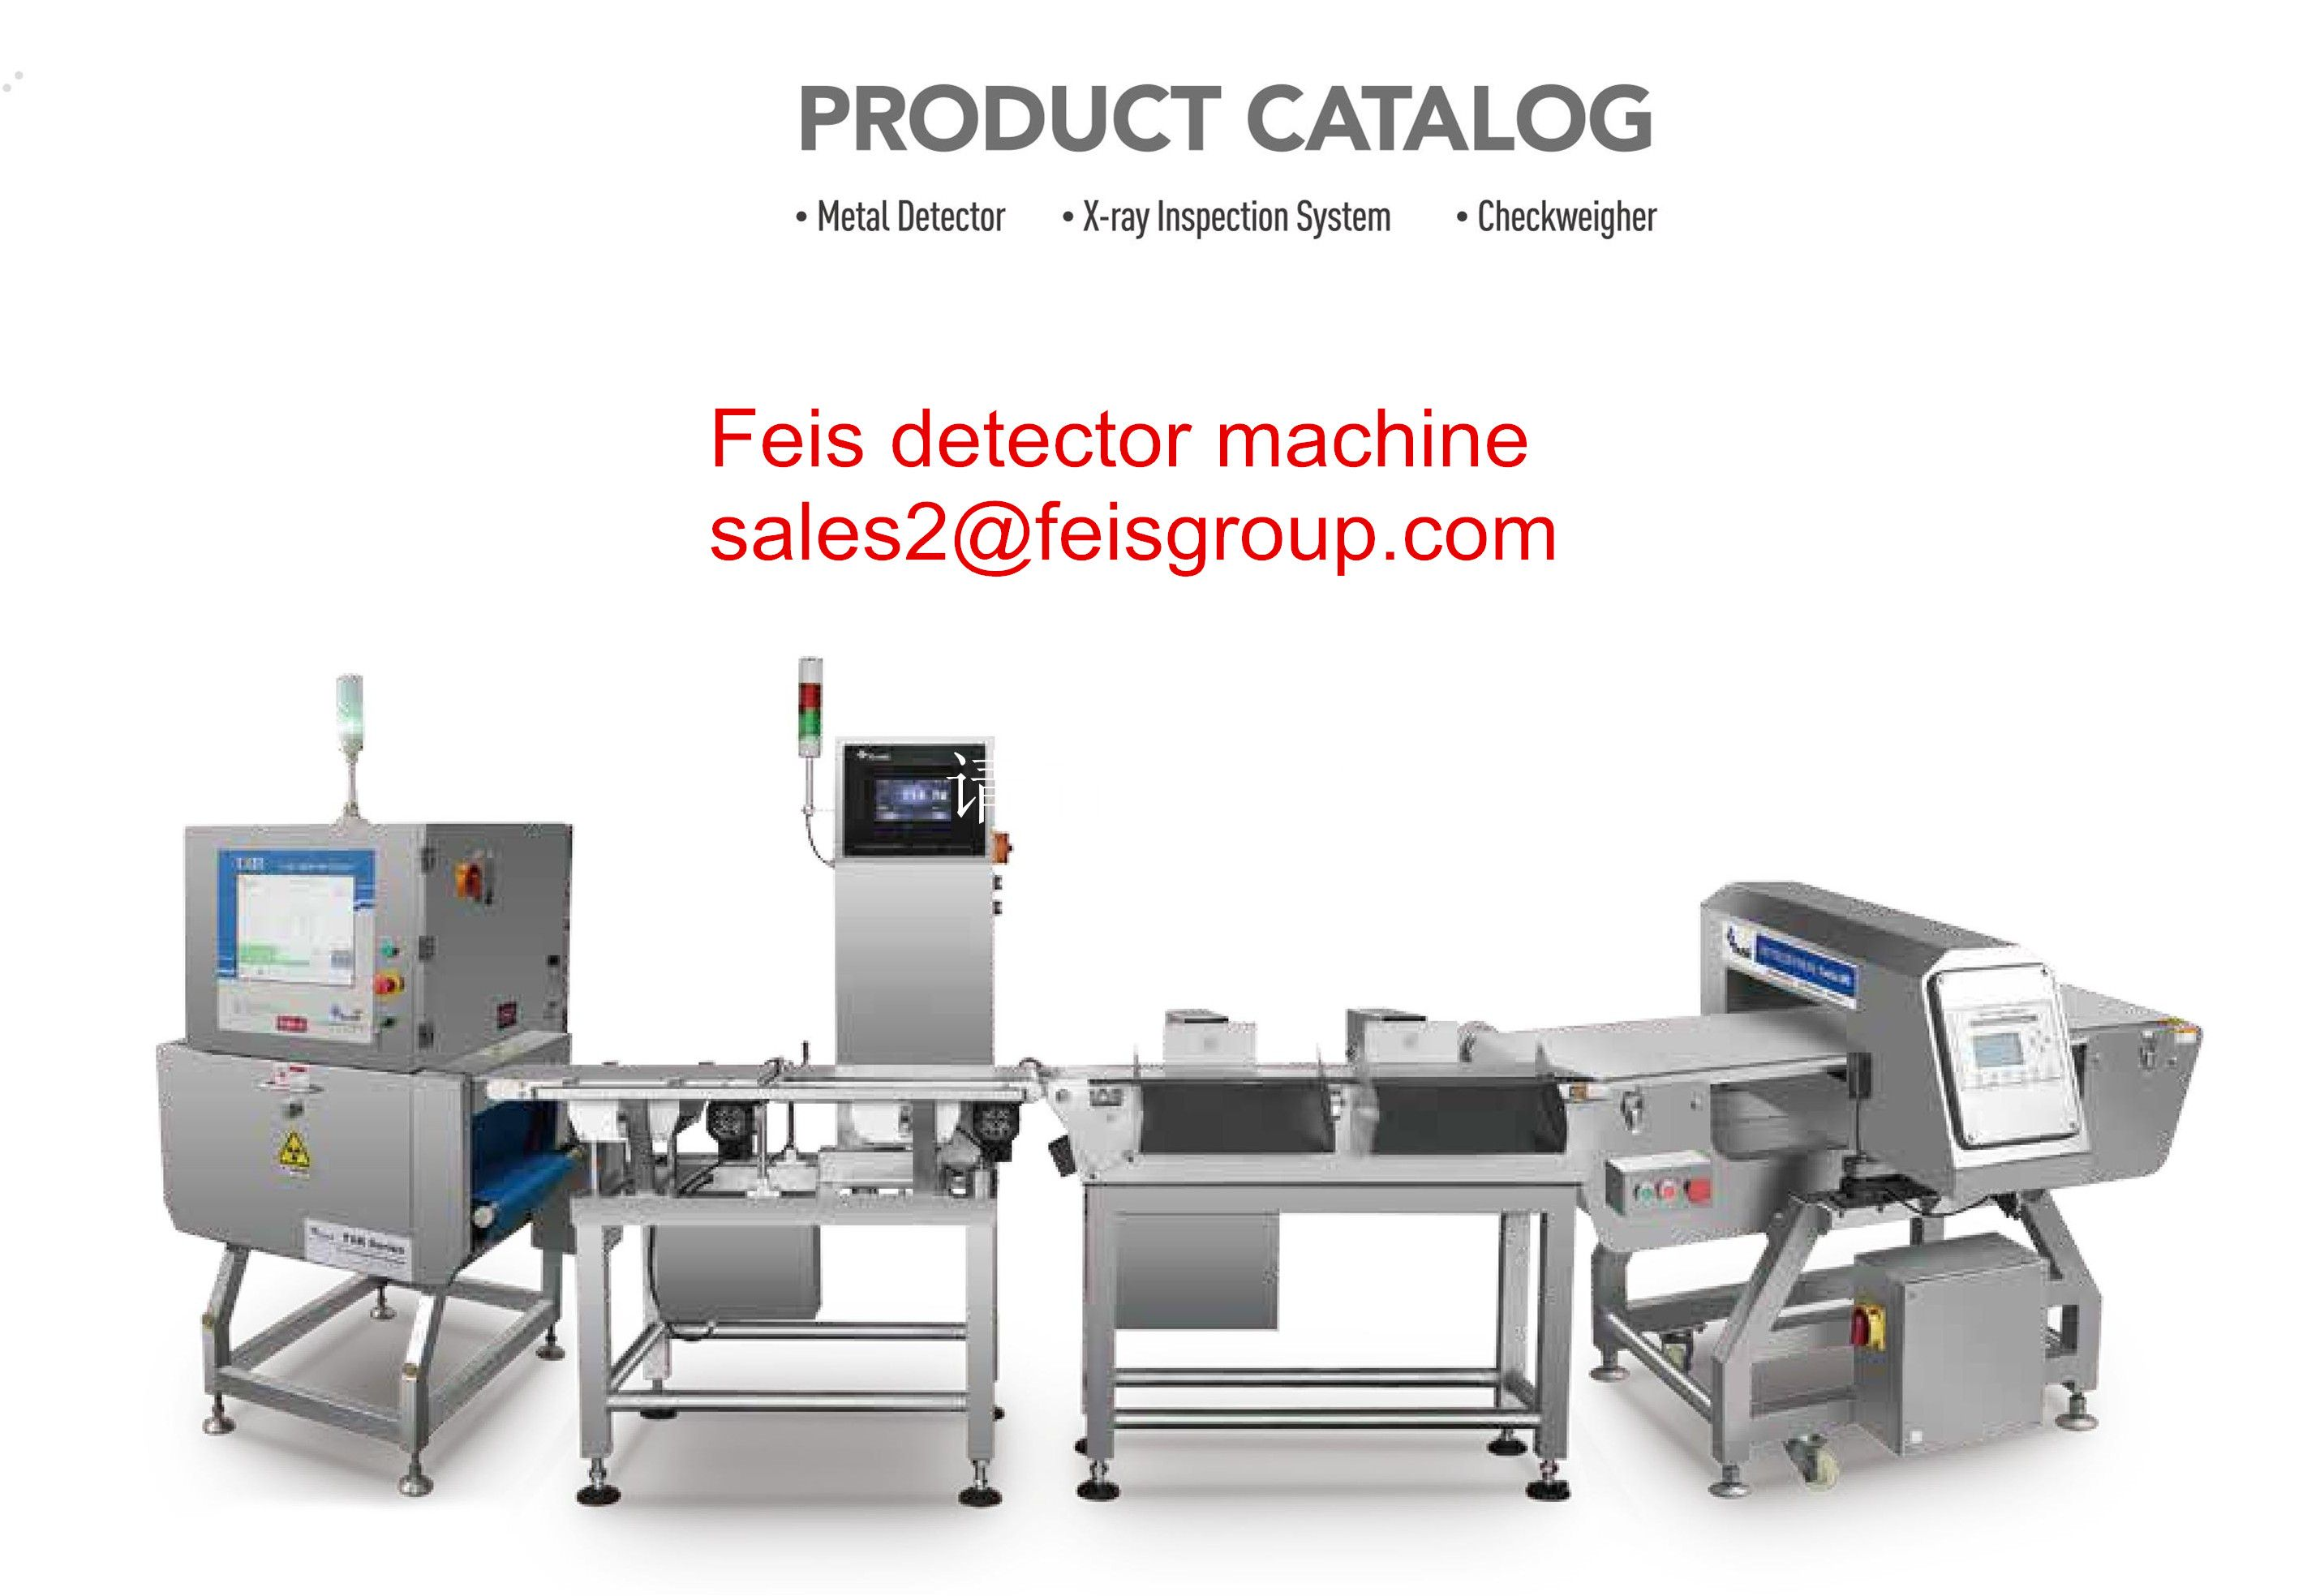 e43fb8f9b7c90eda909dac5fd28c398b needle detector food metal detector full metal detector aluminum